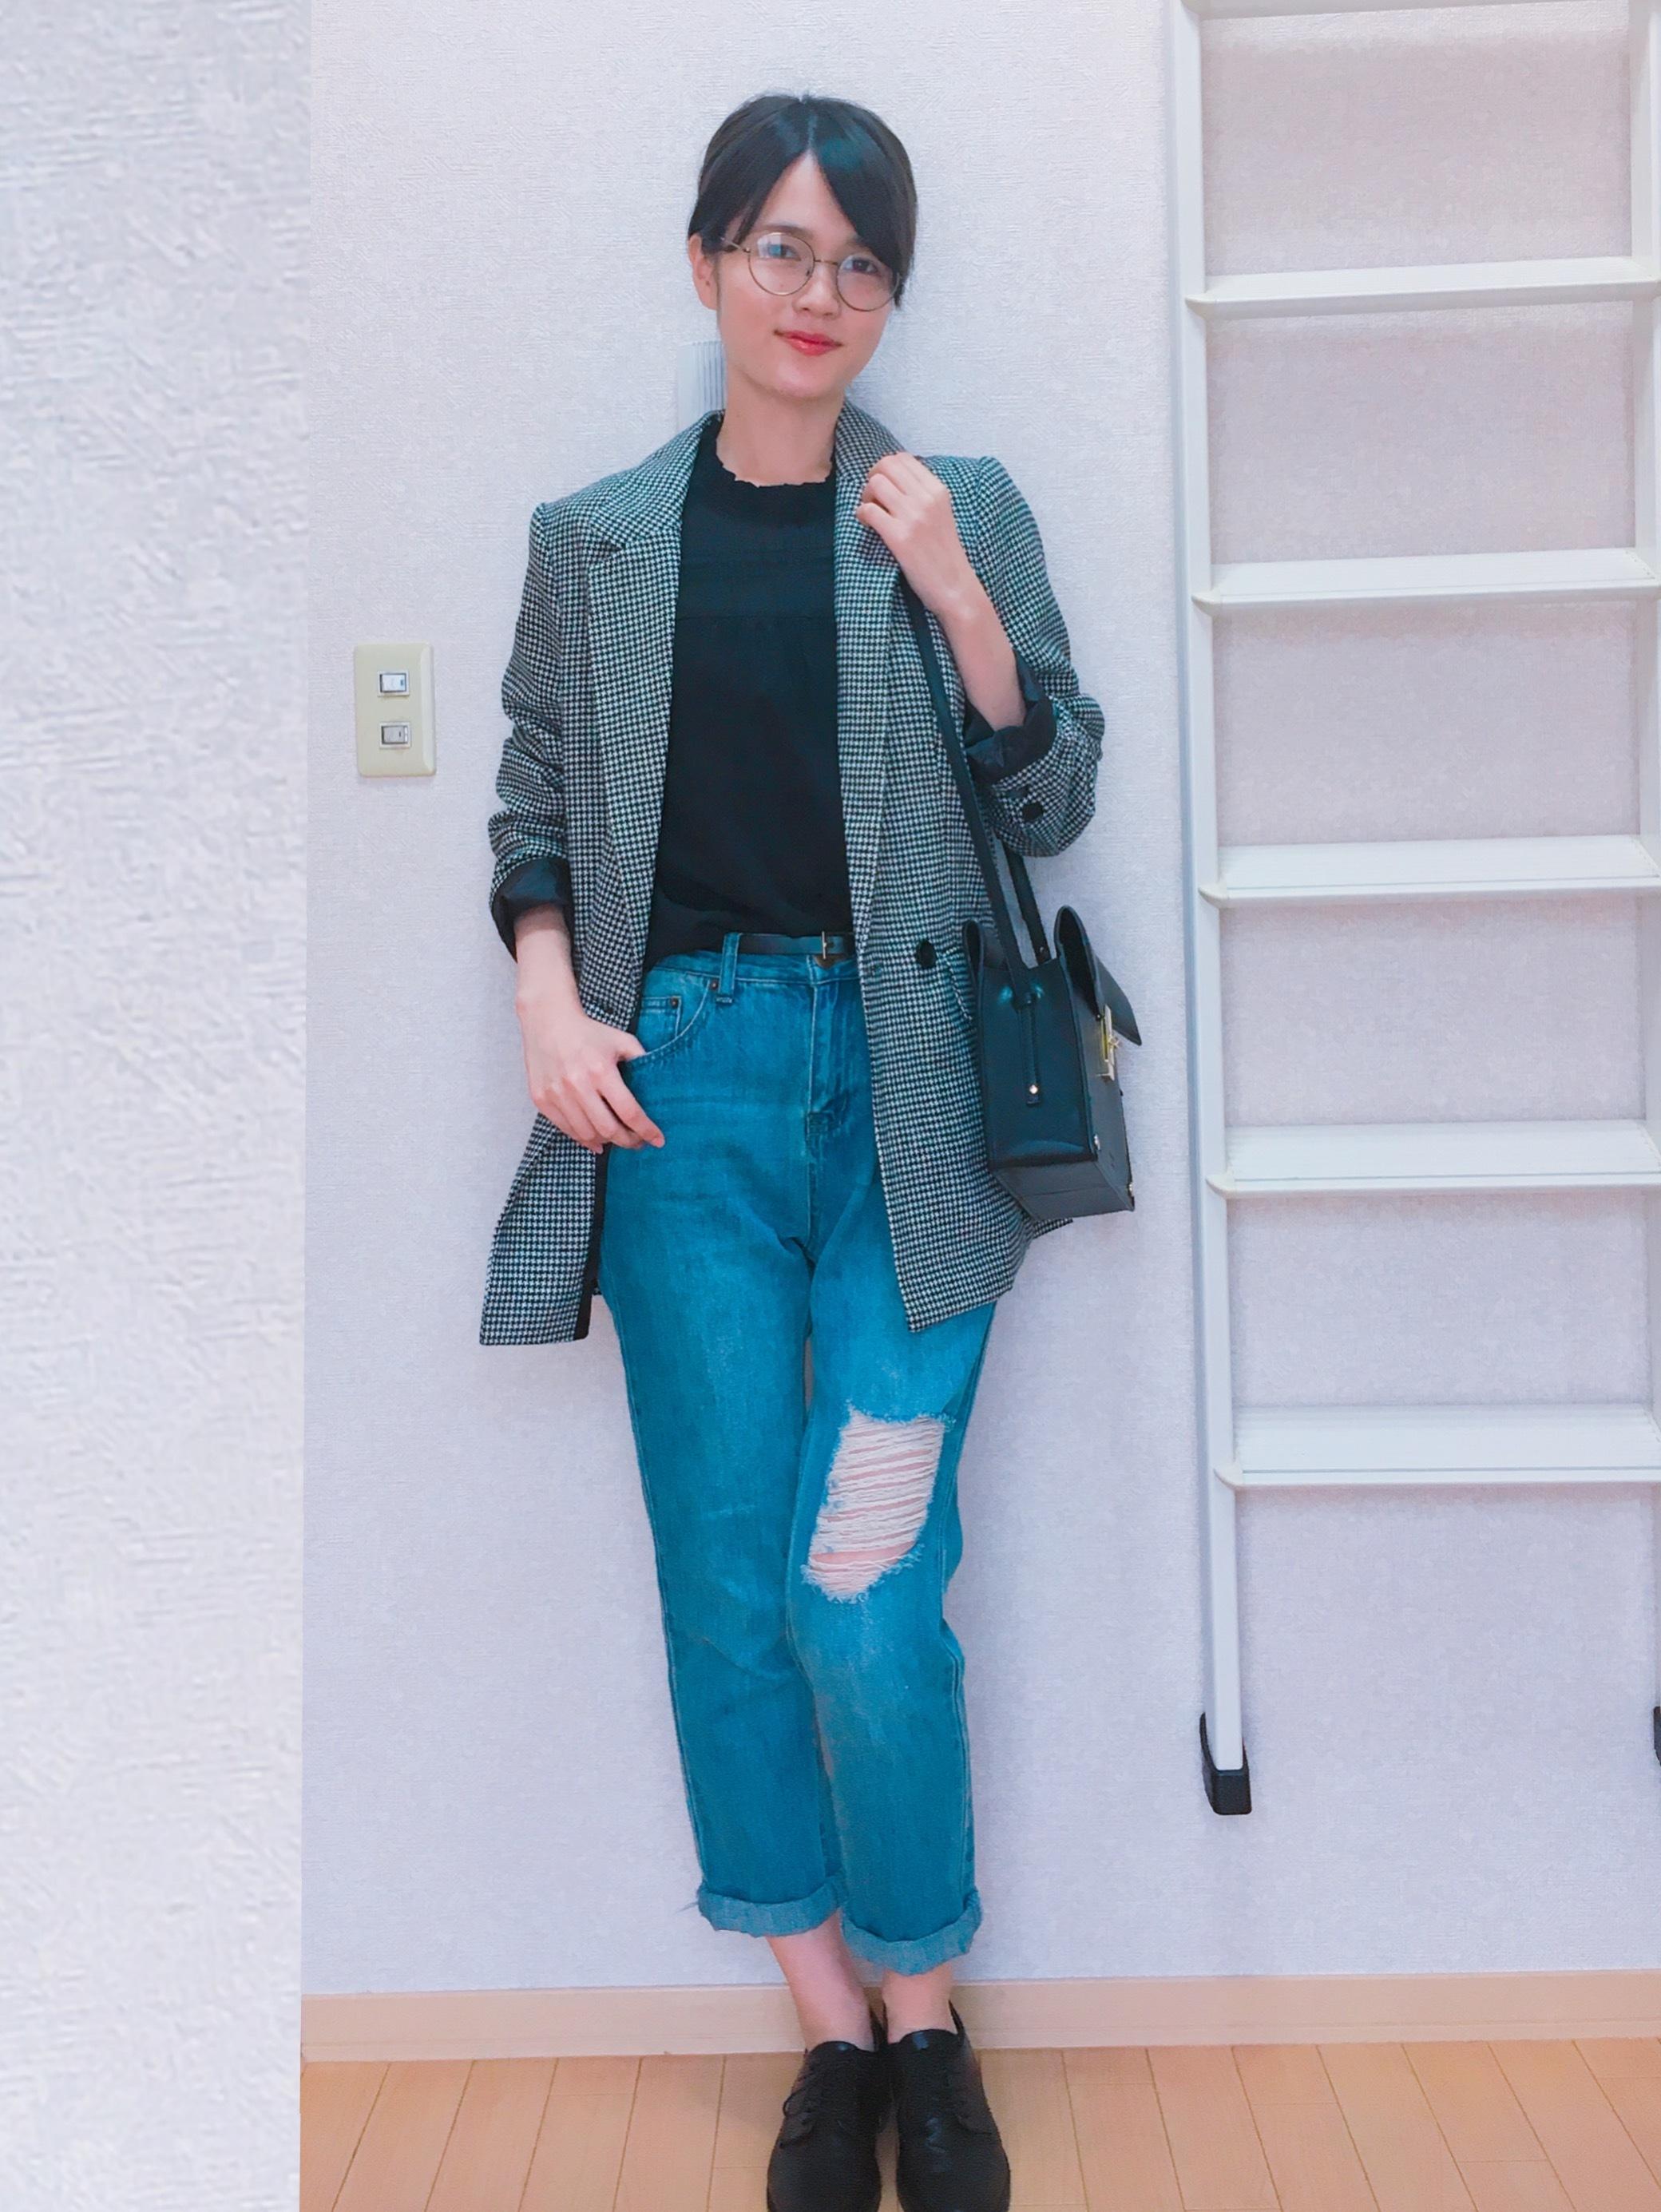 ^o^第36回【服はほぼプチプラ】ジャケットを使ったコーデ3選〜!_1_2